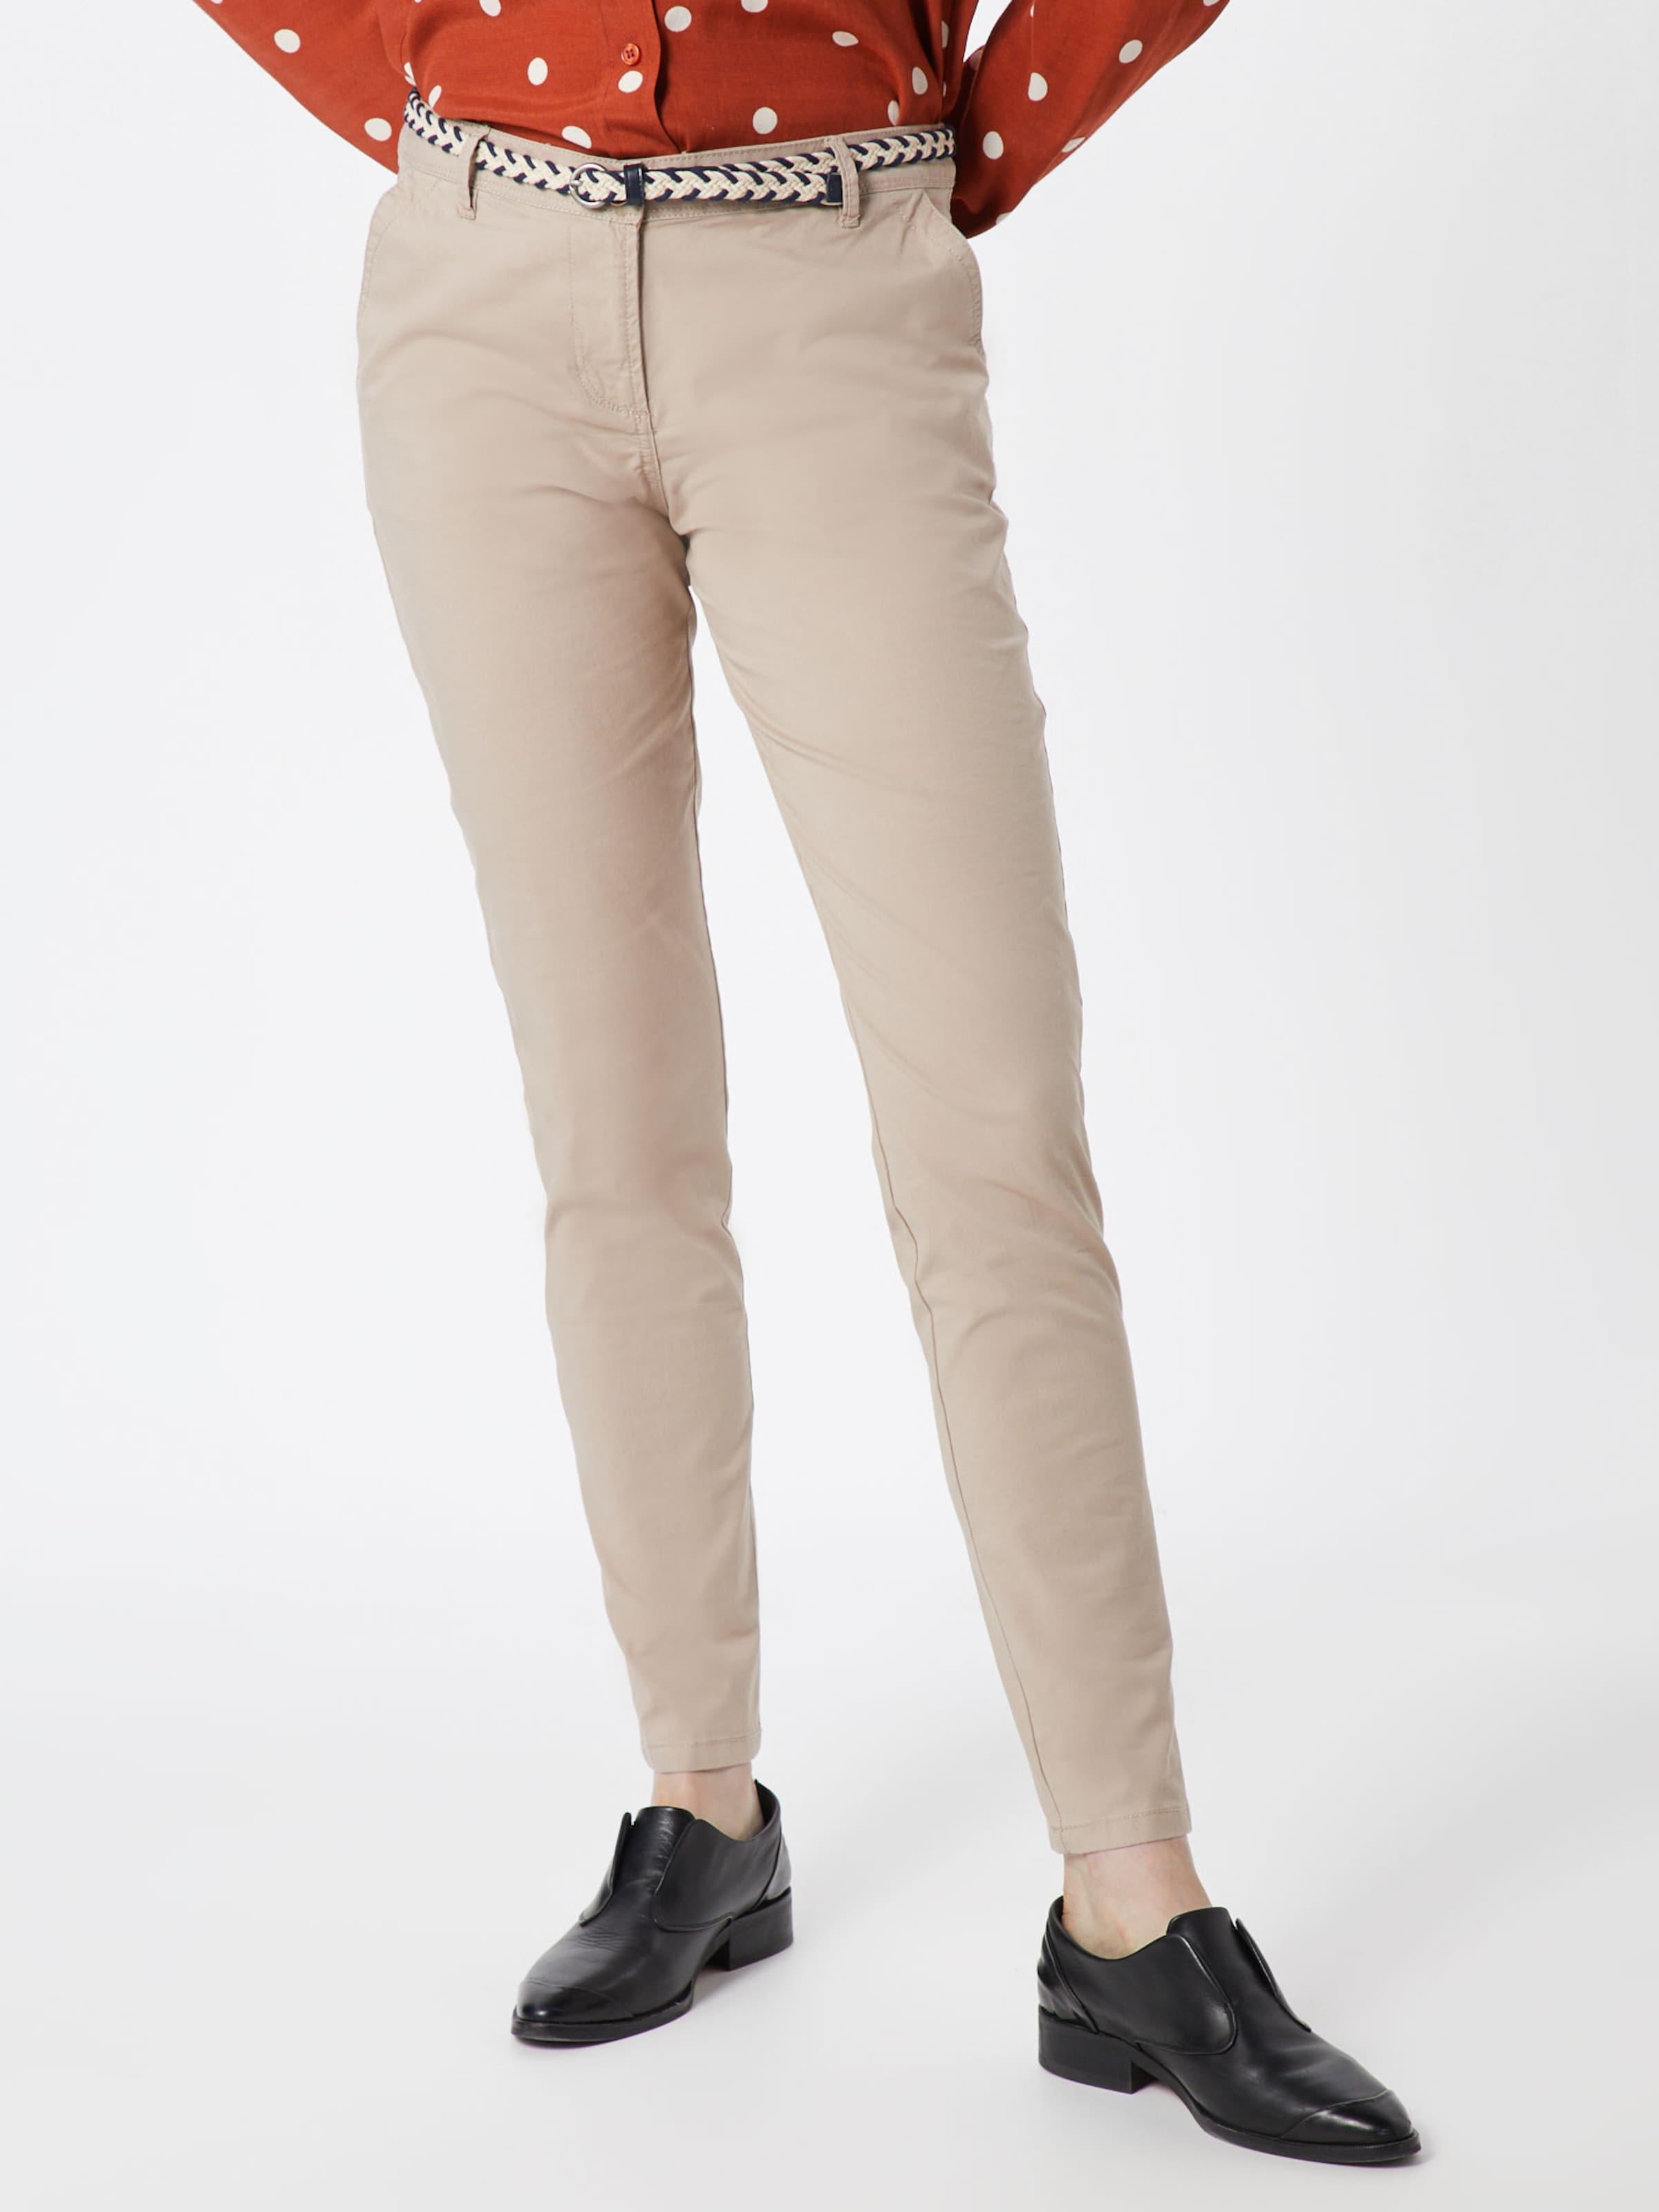 Tom Tailor Camel Pantalon Chino En q3A4RjL5